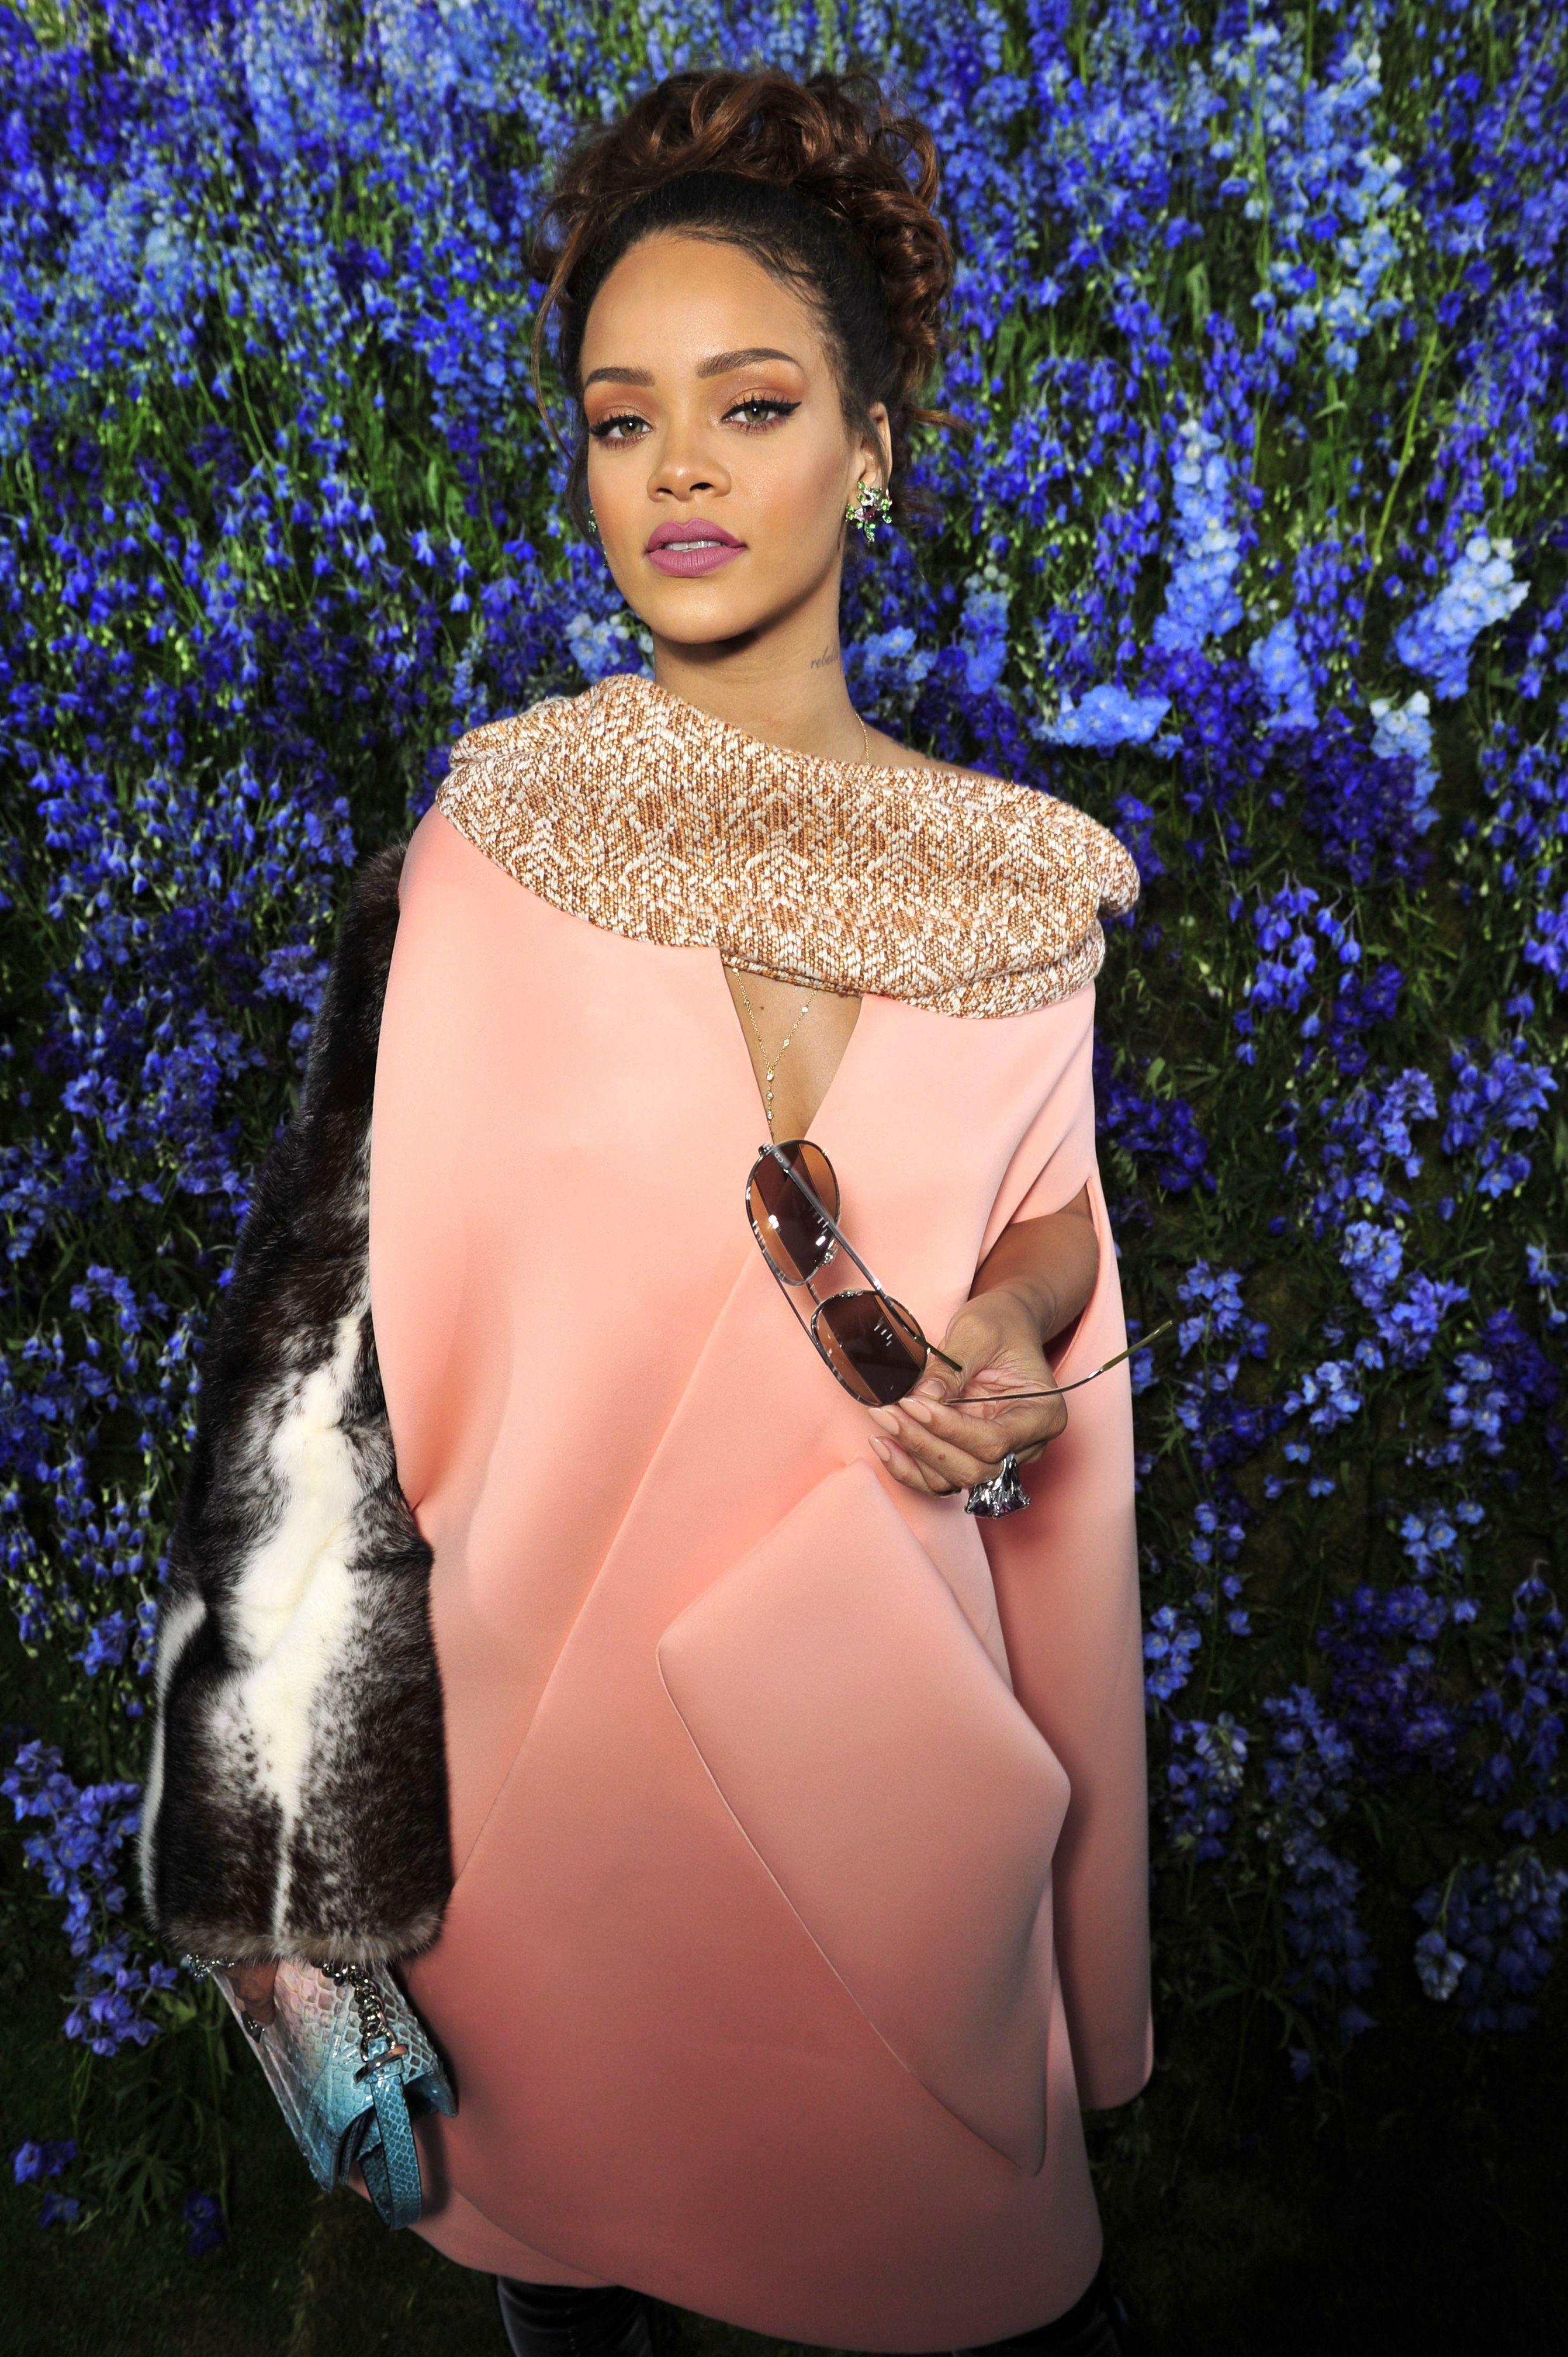 Rihanna launches two creative agencies